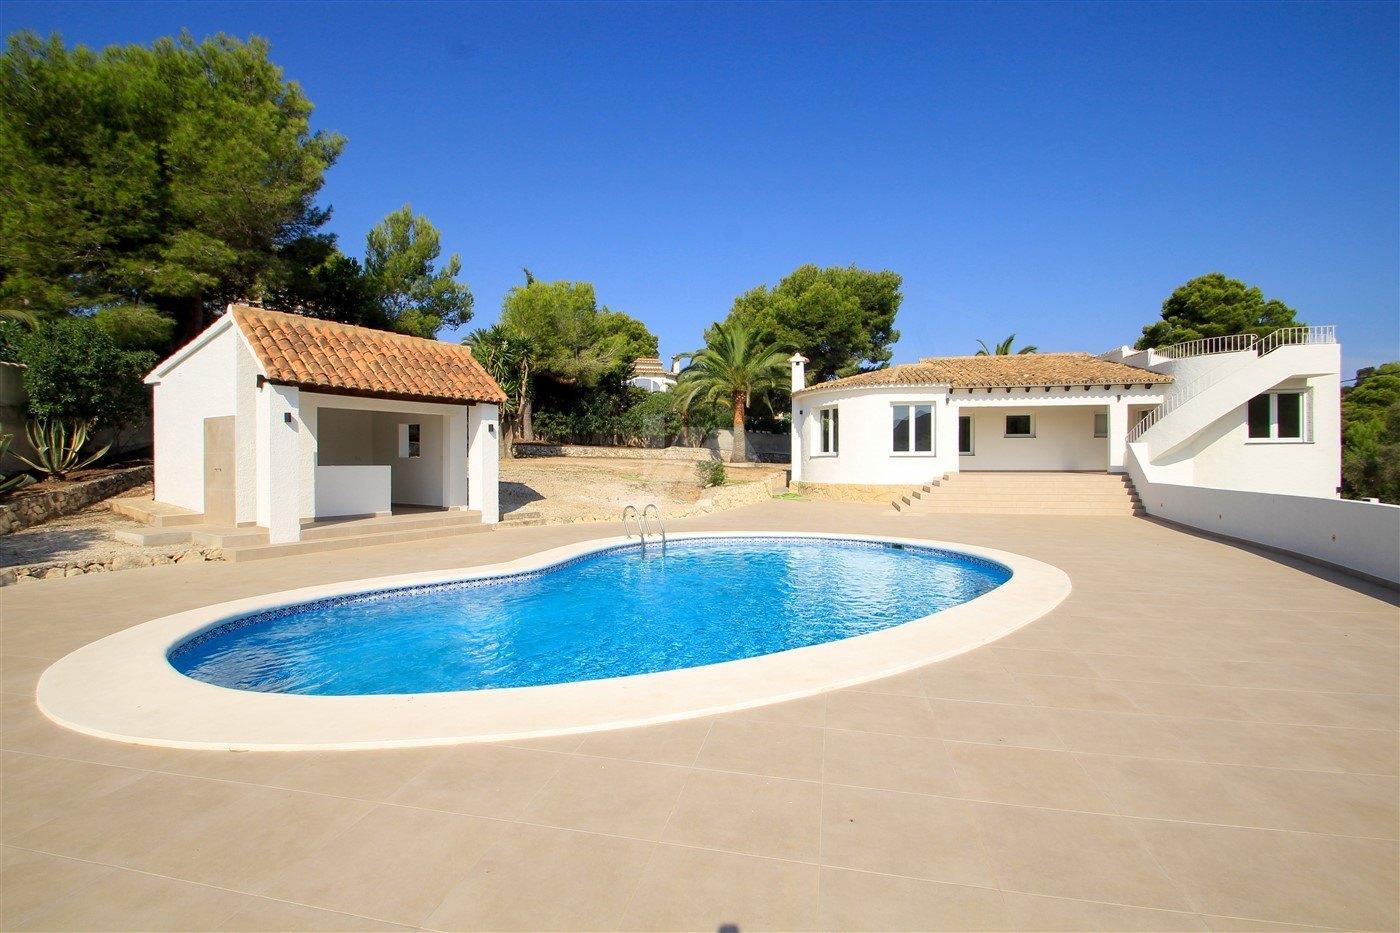 Reformed Villa for sale in Moraira, Costa Blanca.